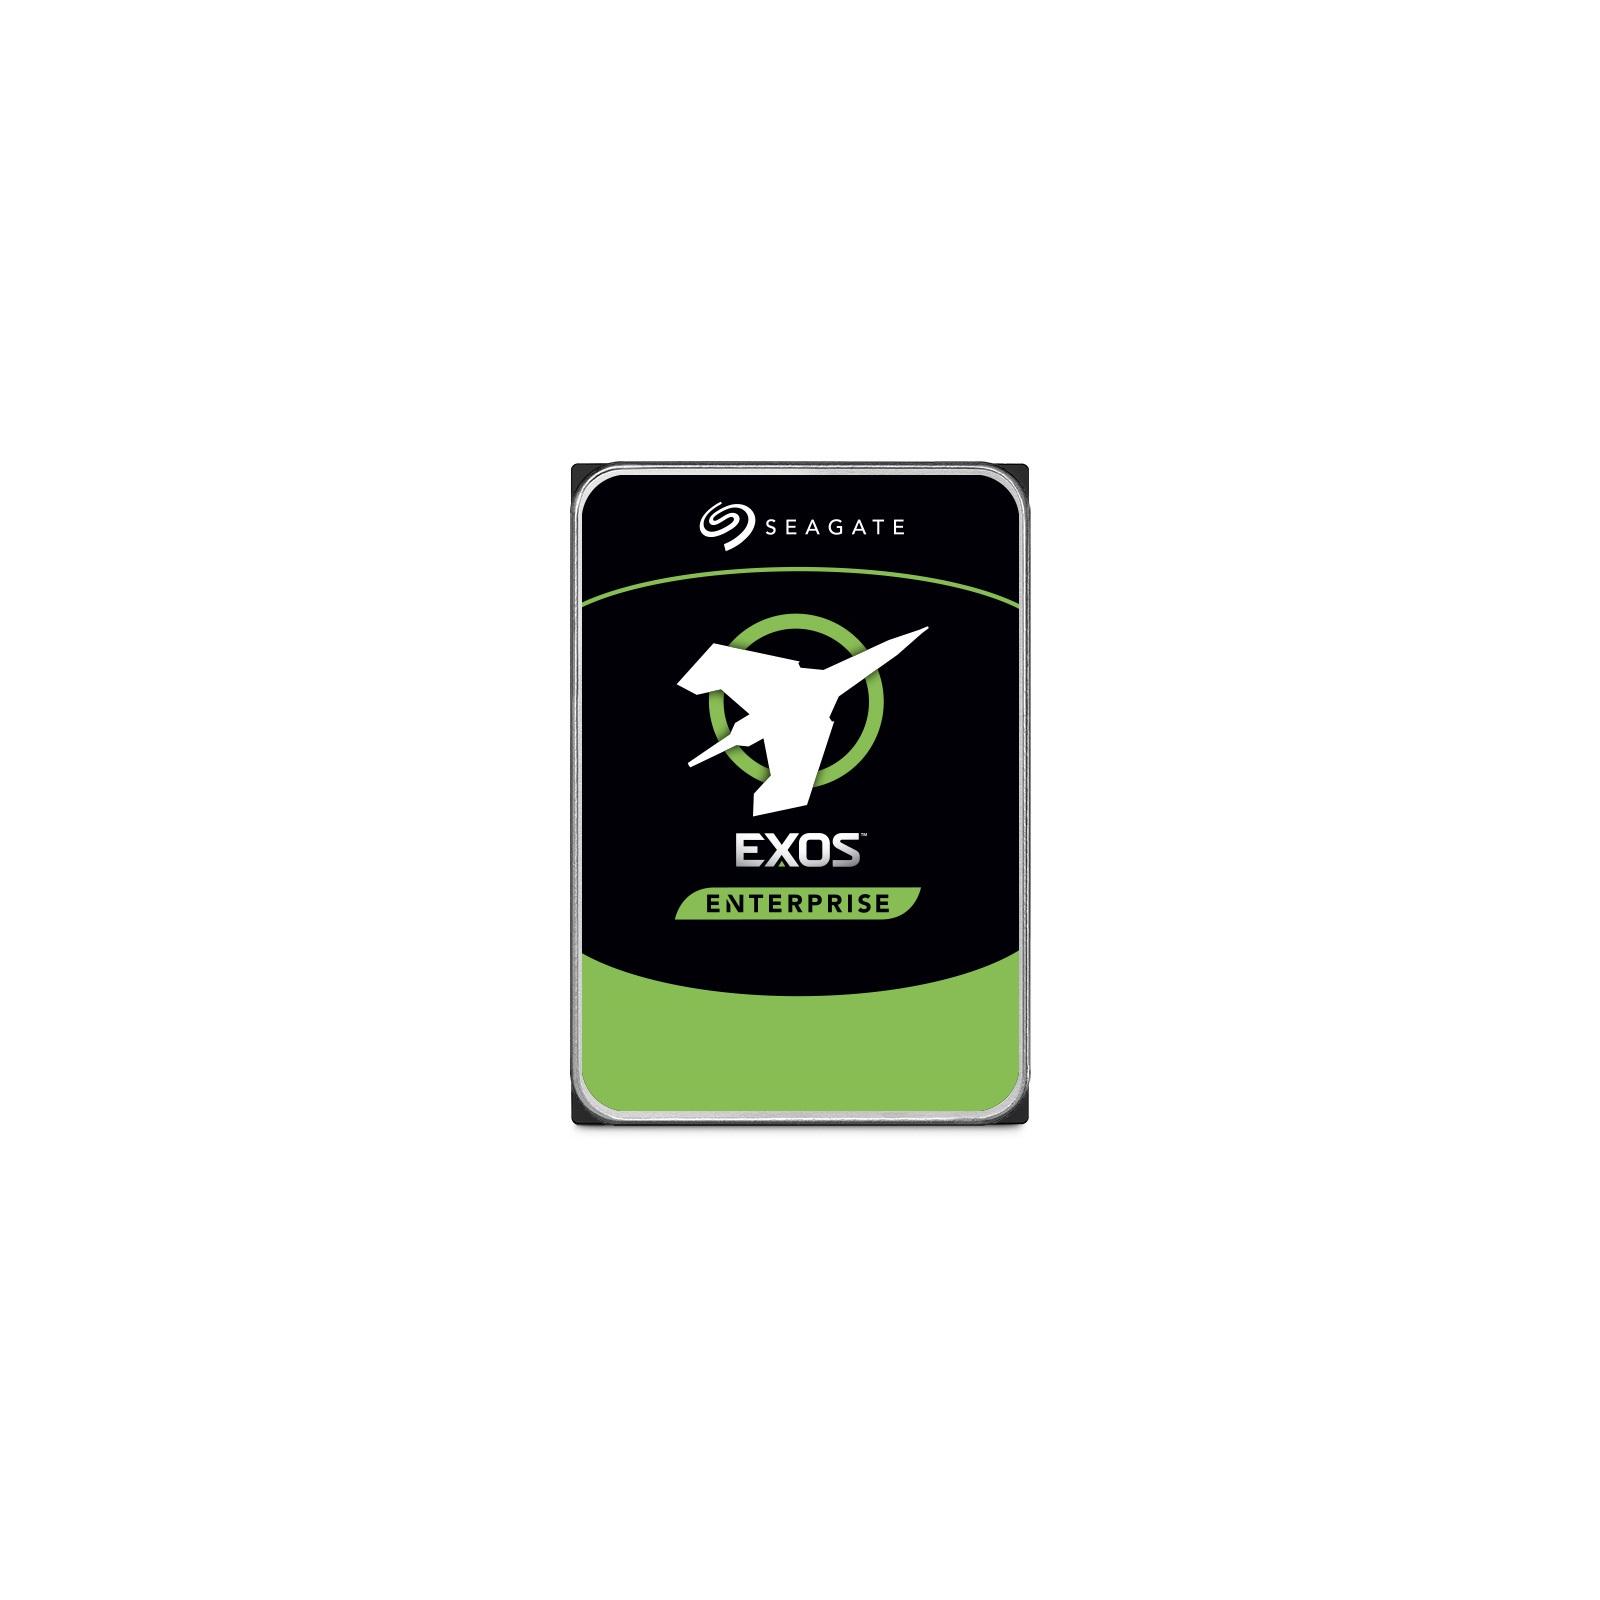 Жесткий диск для сервера 600GB Seagate (ST600MM0009)